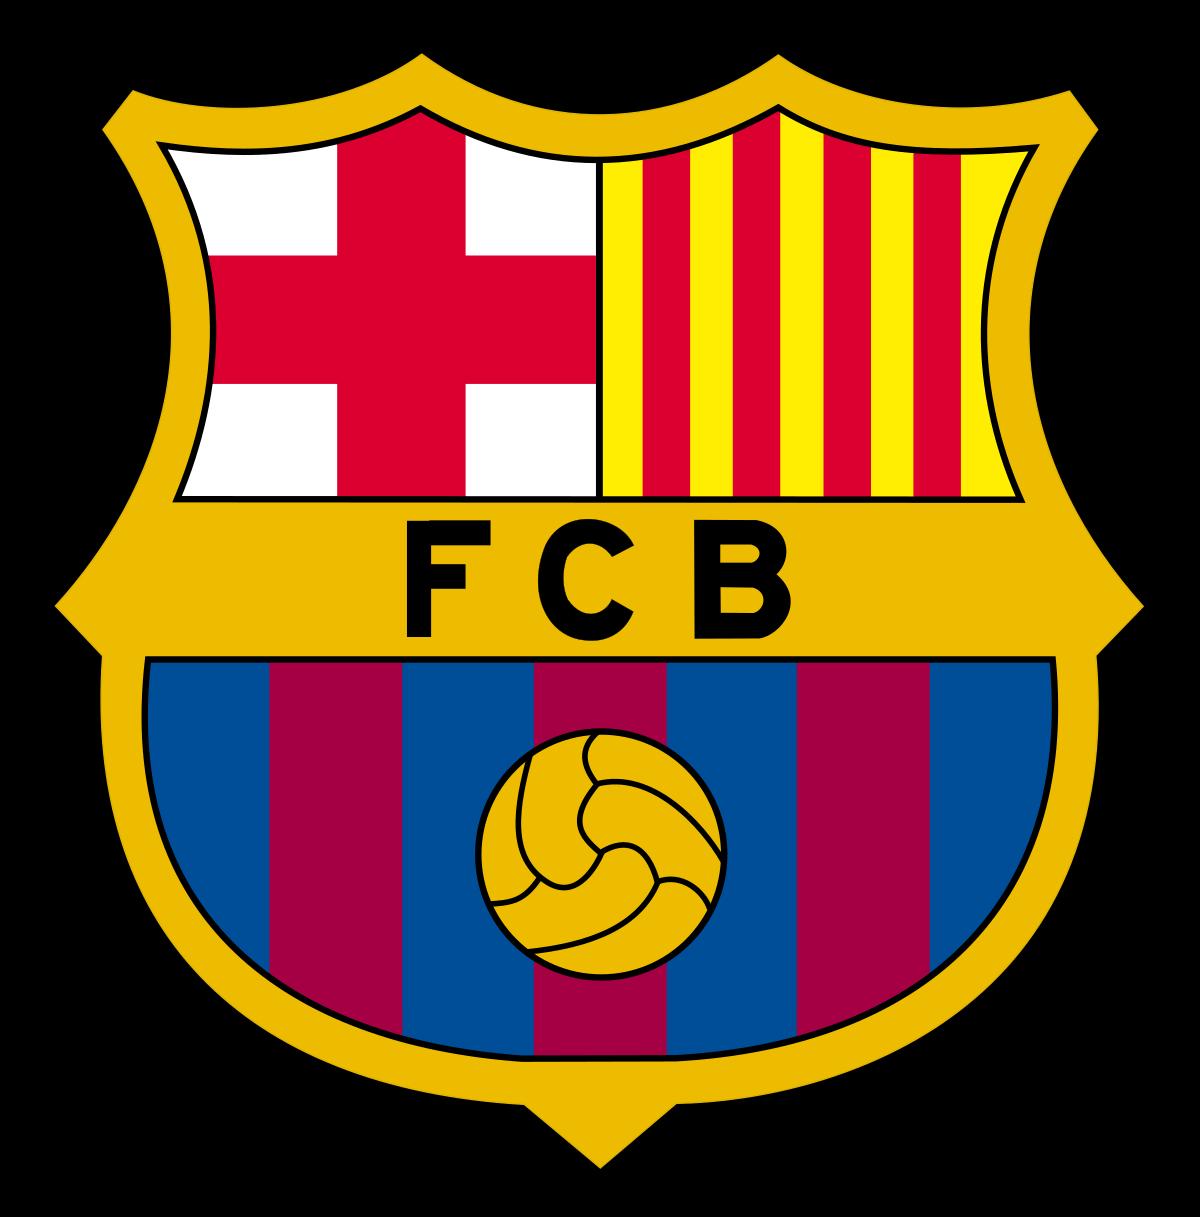 Barcelona - Ποδόσφαιρο